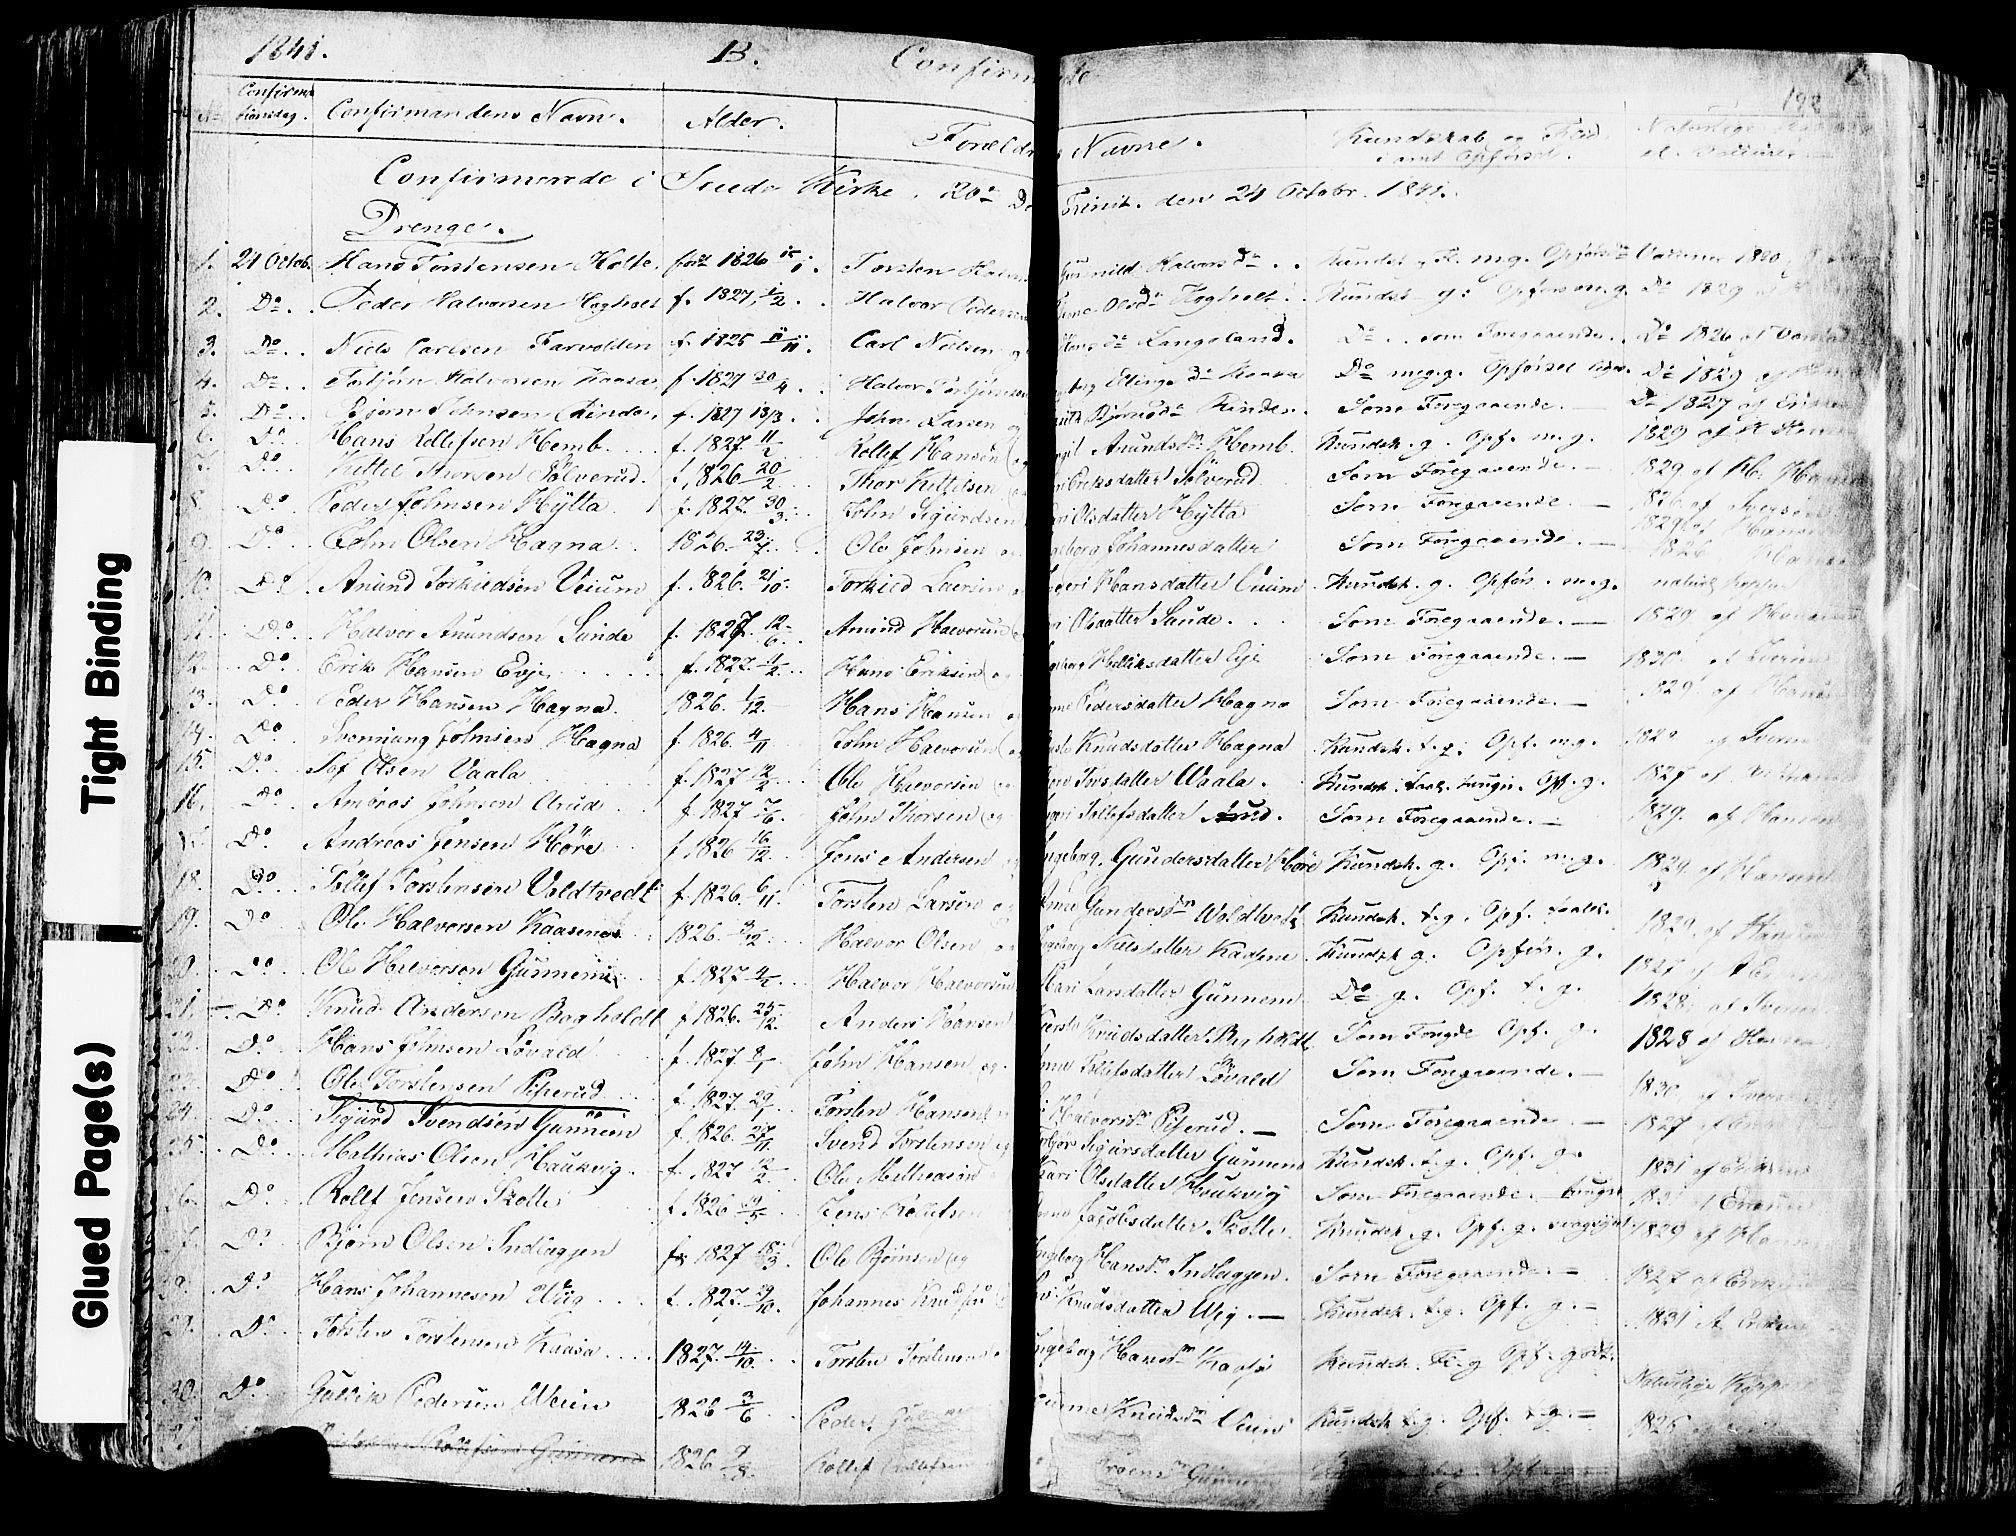 SAKO, Sauherad kirkebøker, F/Fa/L0006: Ministerialbok nr. I 6, 1827-1850, s. 192